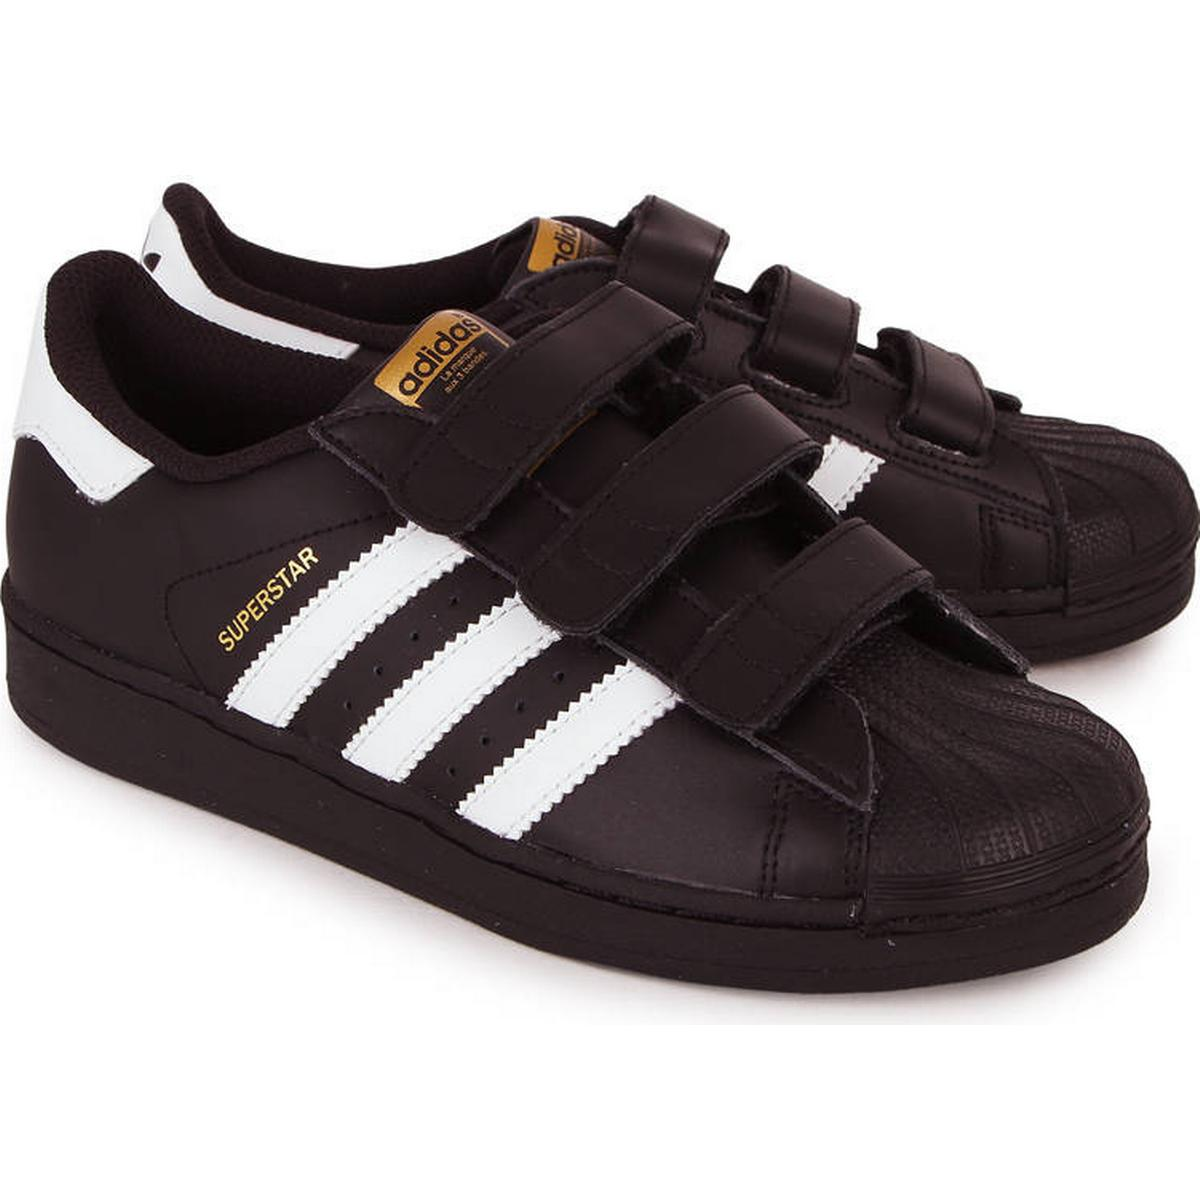 928873507099 Adidas Pigesko Børnesko - Sammenlign priser hos PriceRunner